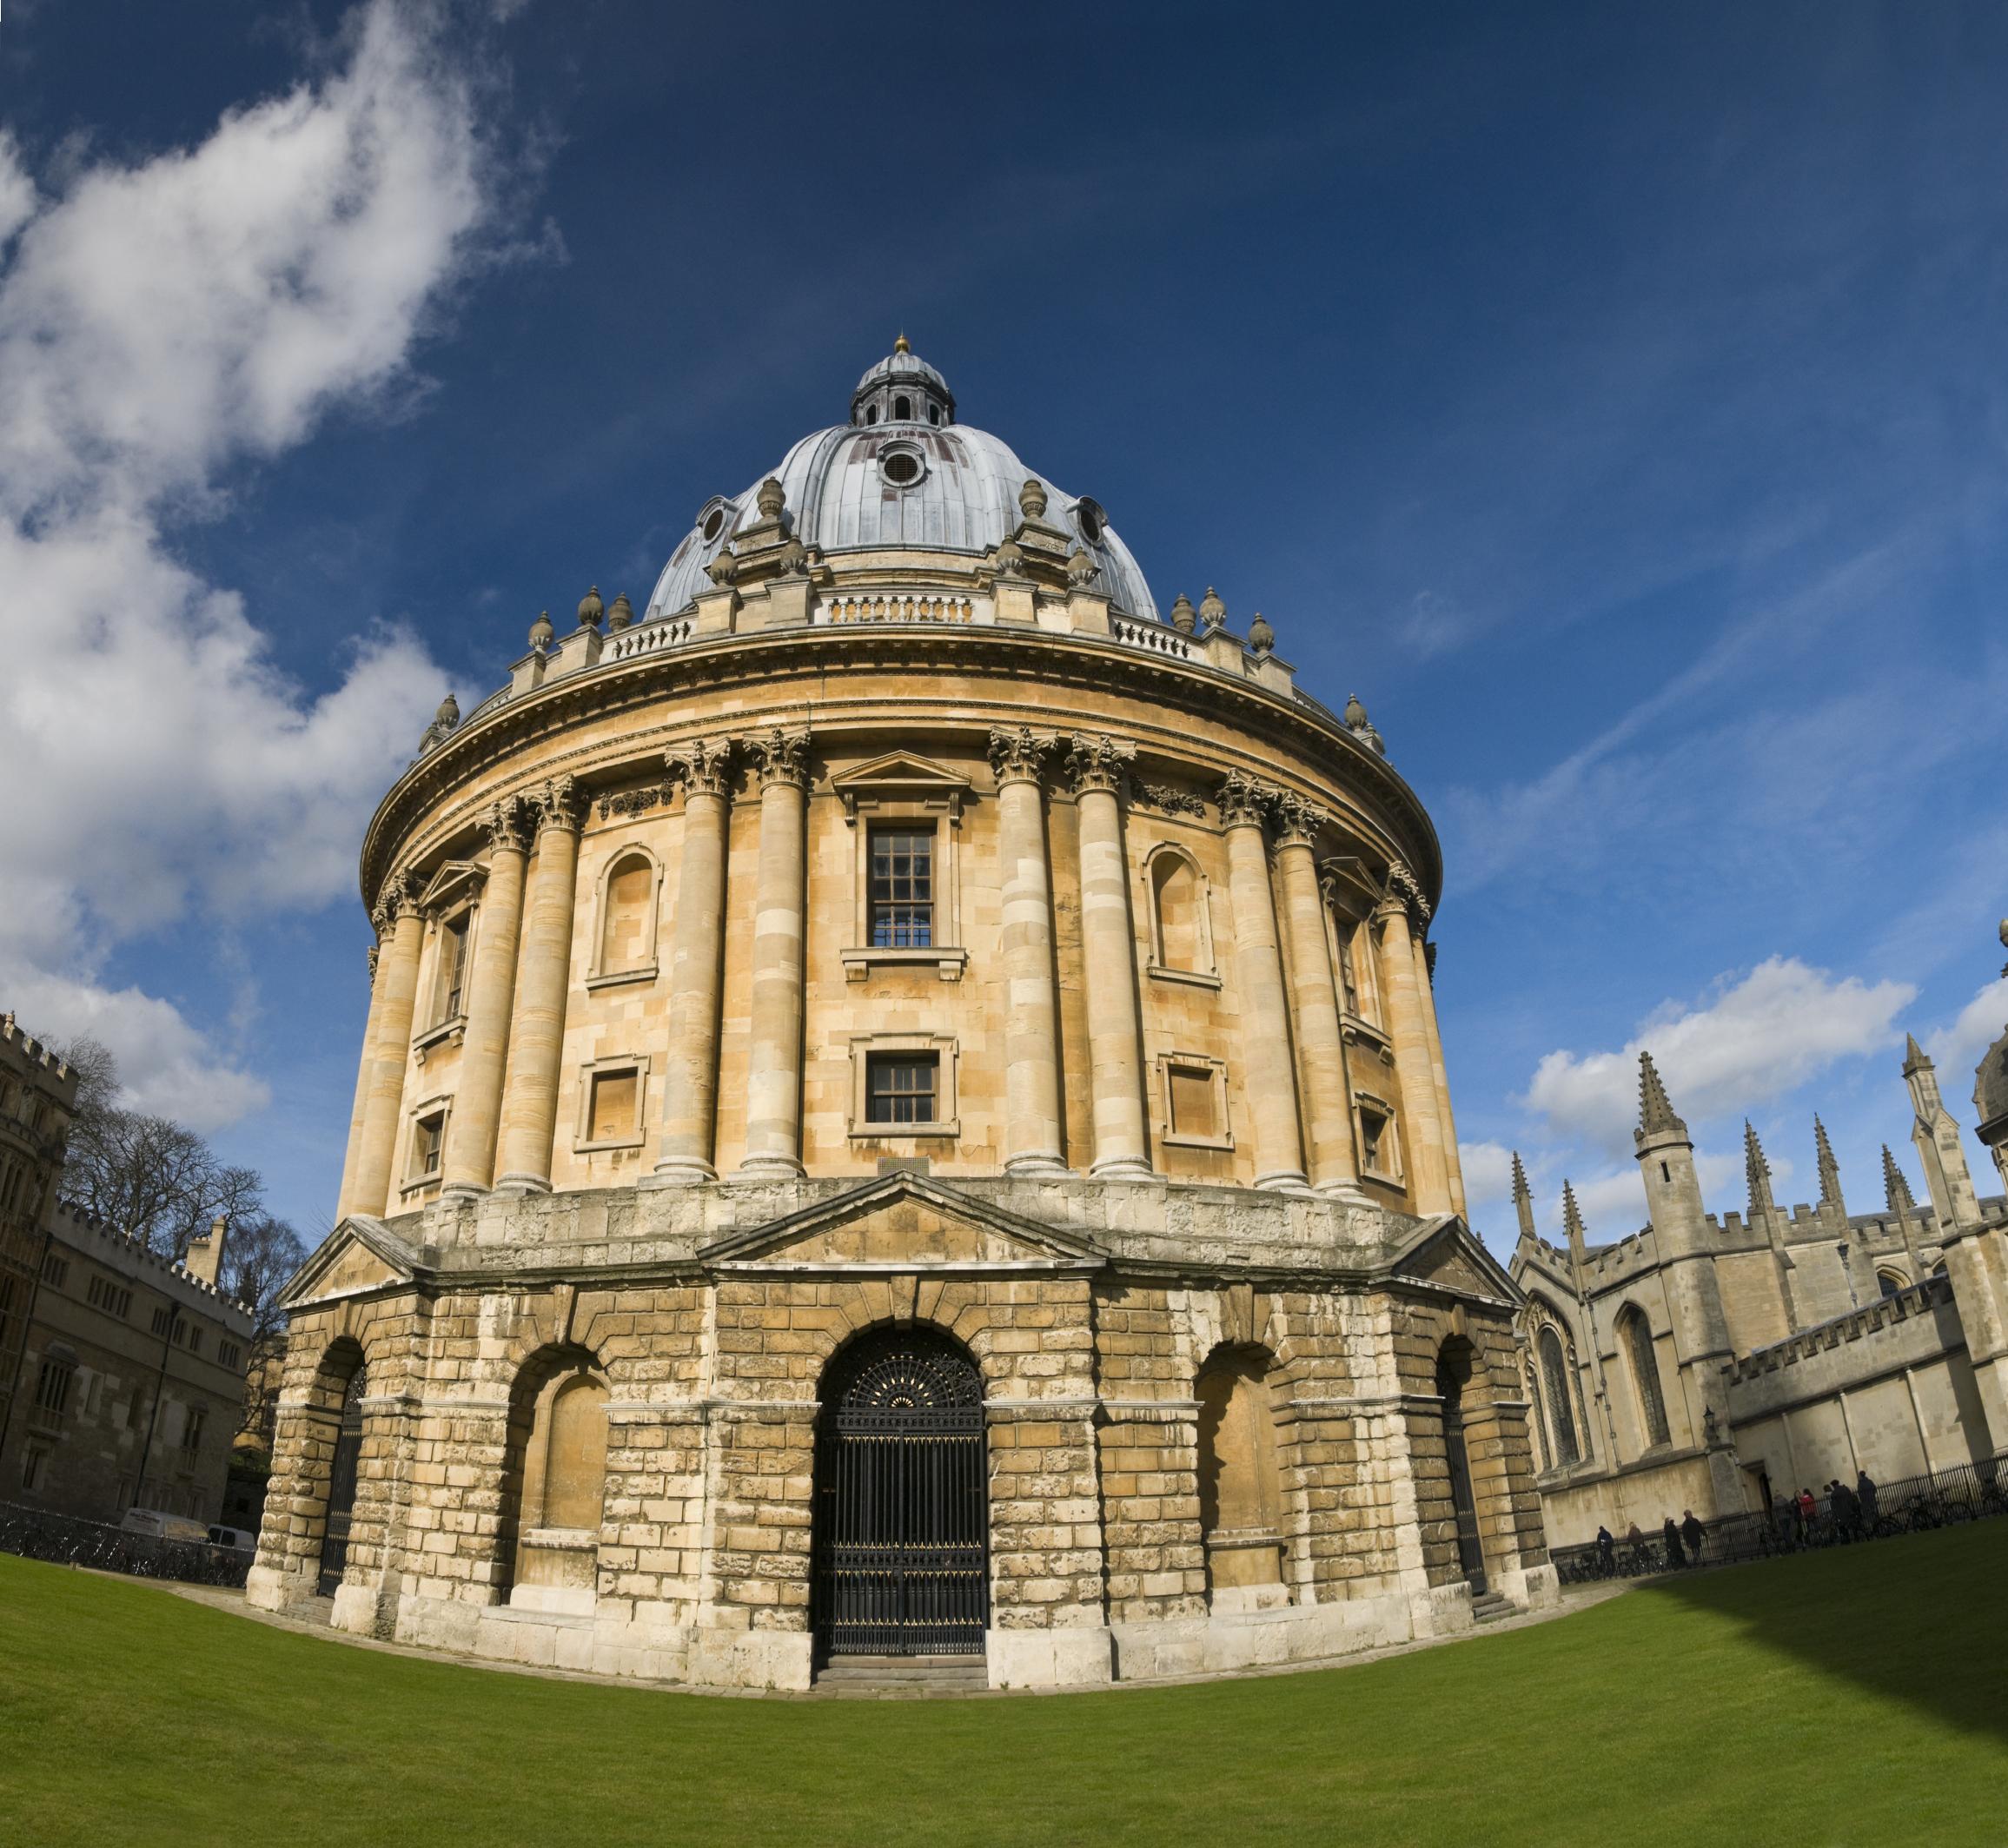 Oxford, Radcliffe Camera